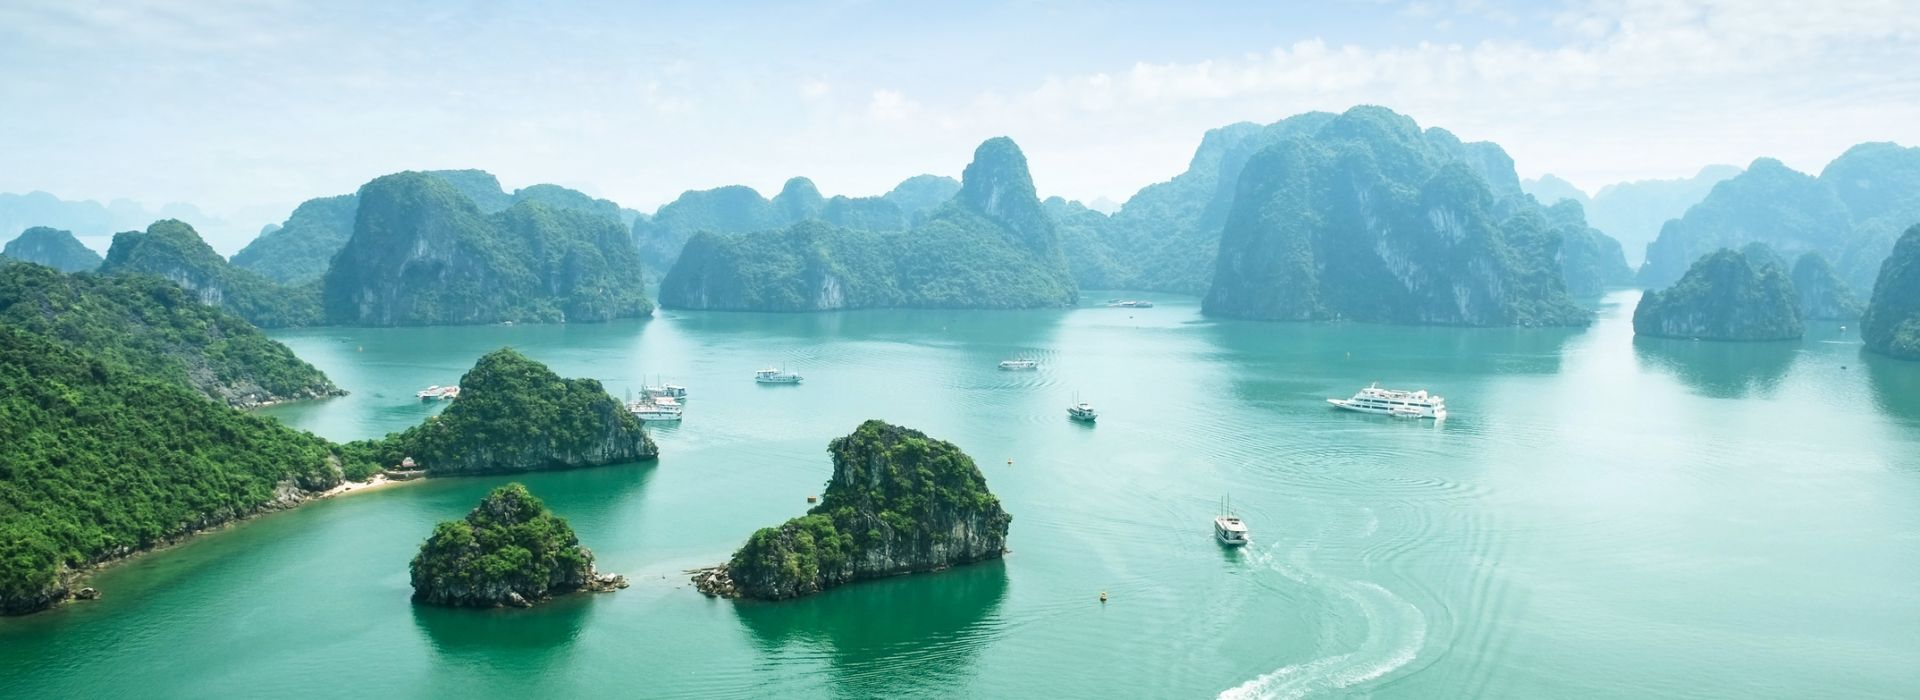 Explorer Tours in Ninh Binh